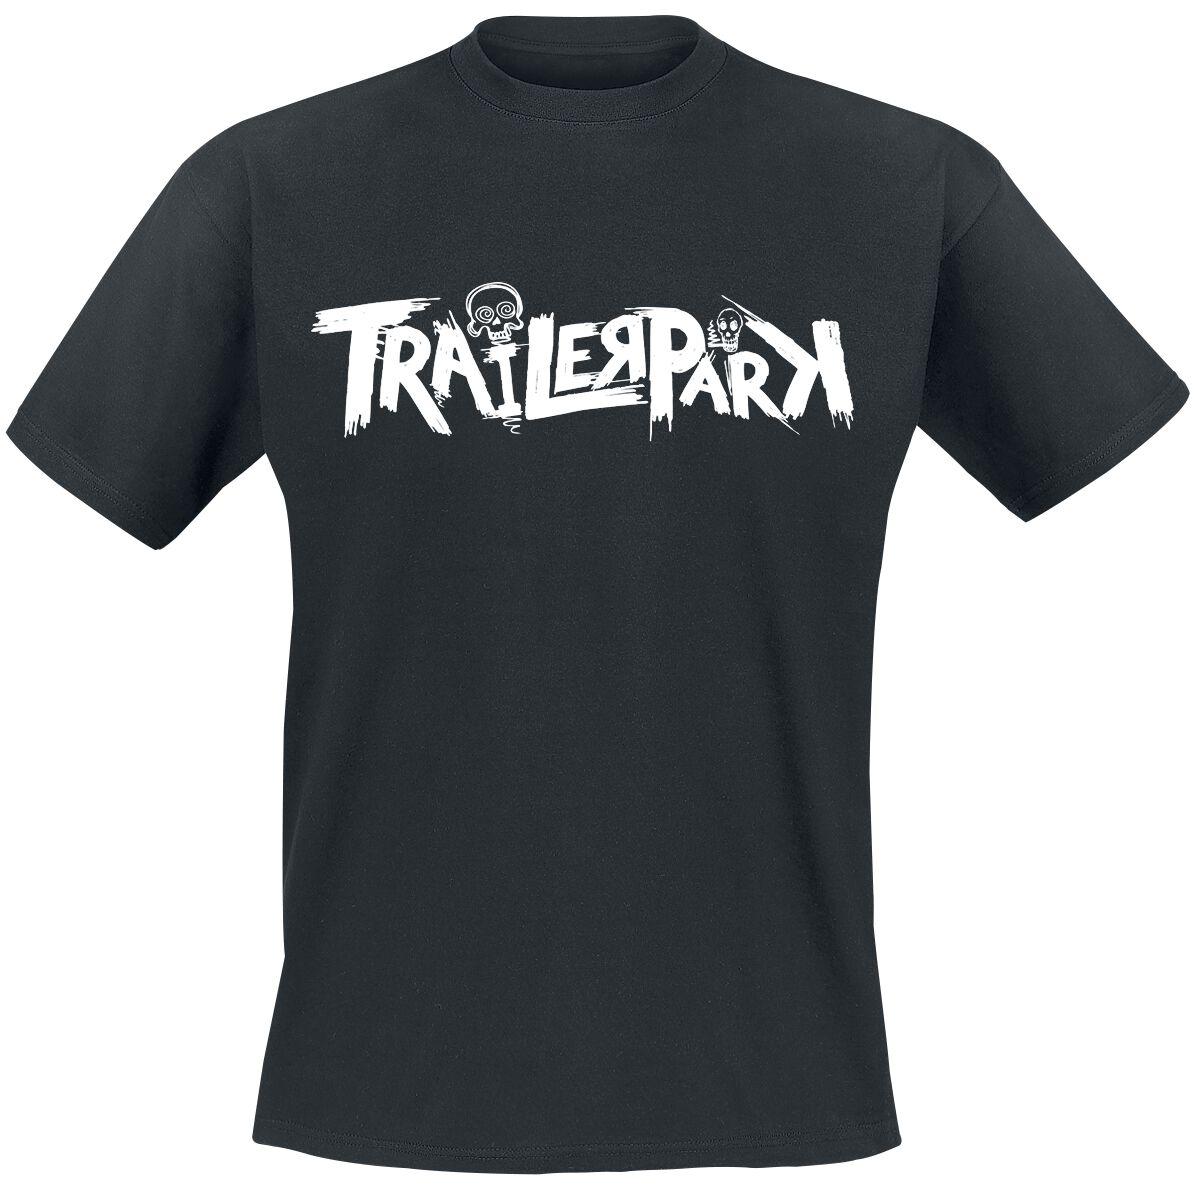 Zespoły - Koszulki - T-Shirt Trailerpark Logo 2 T-Shirt czarny - 375946